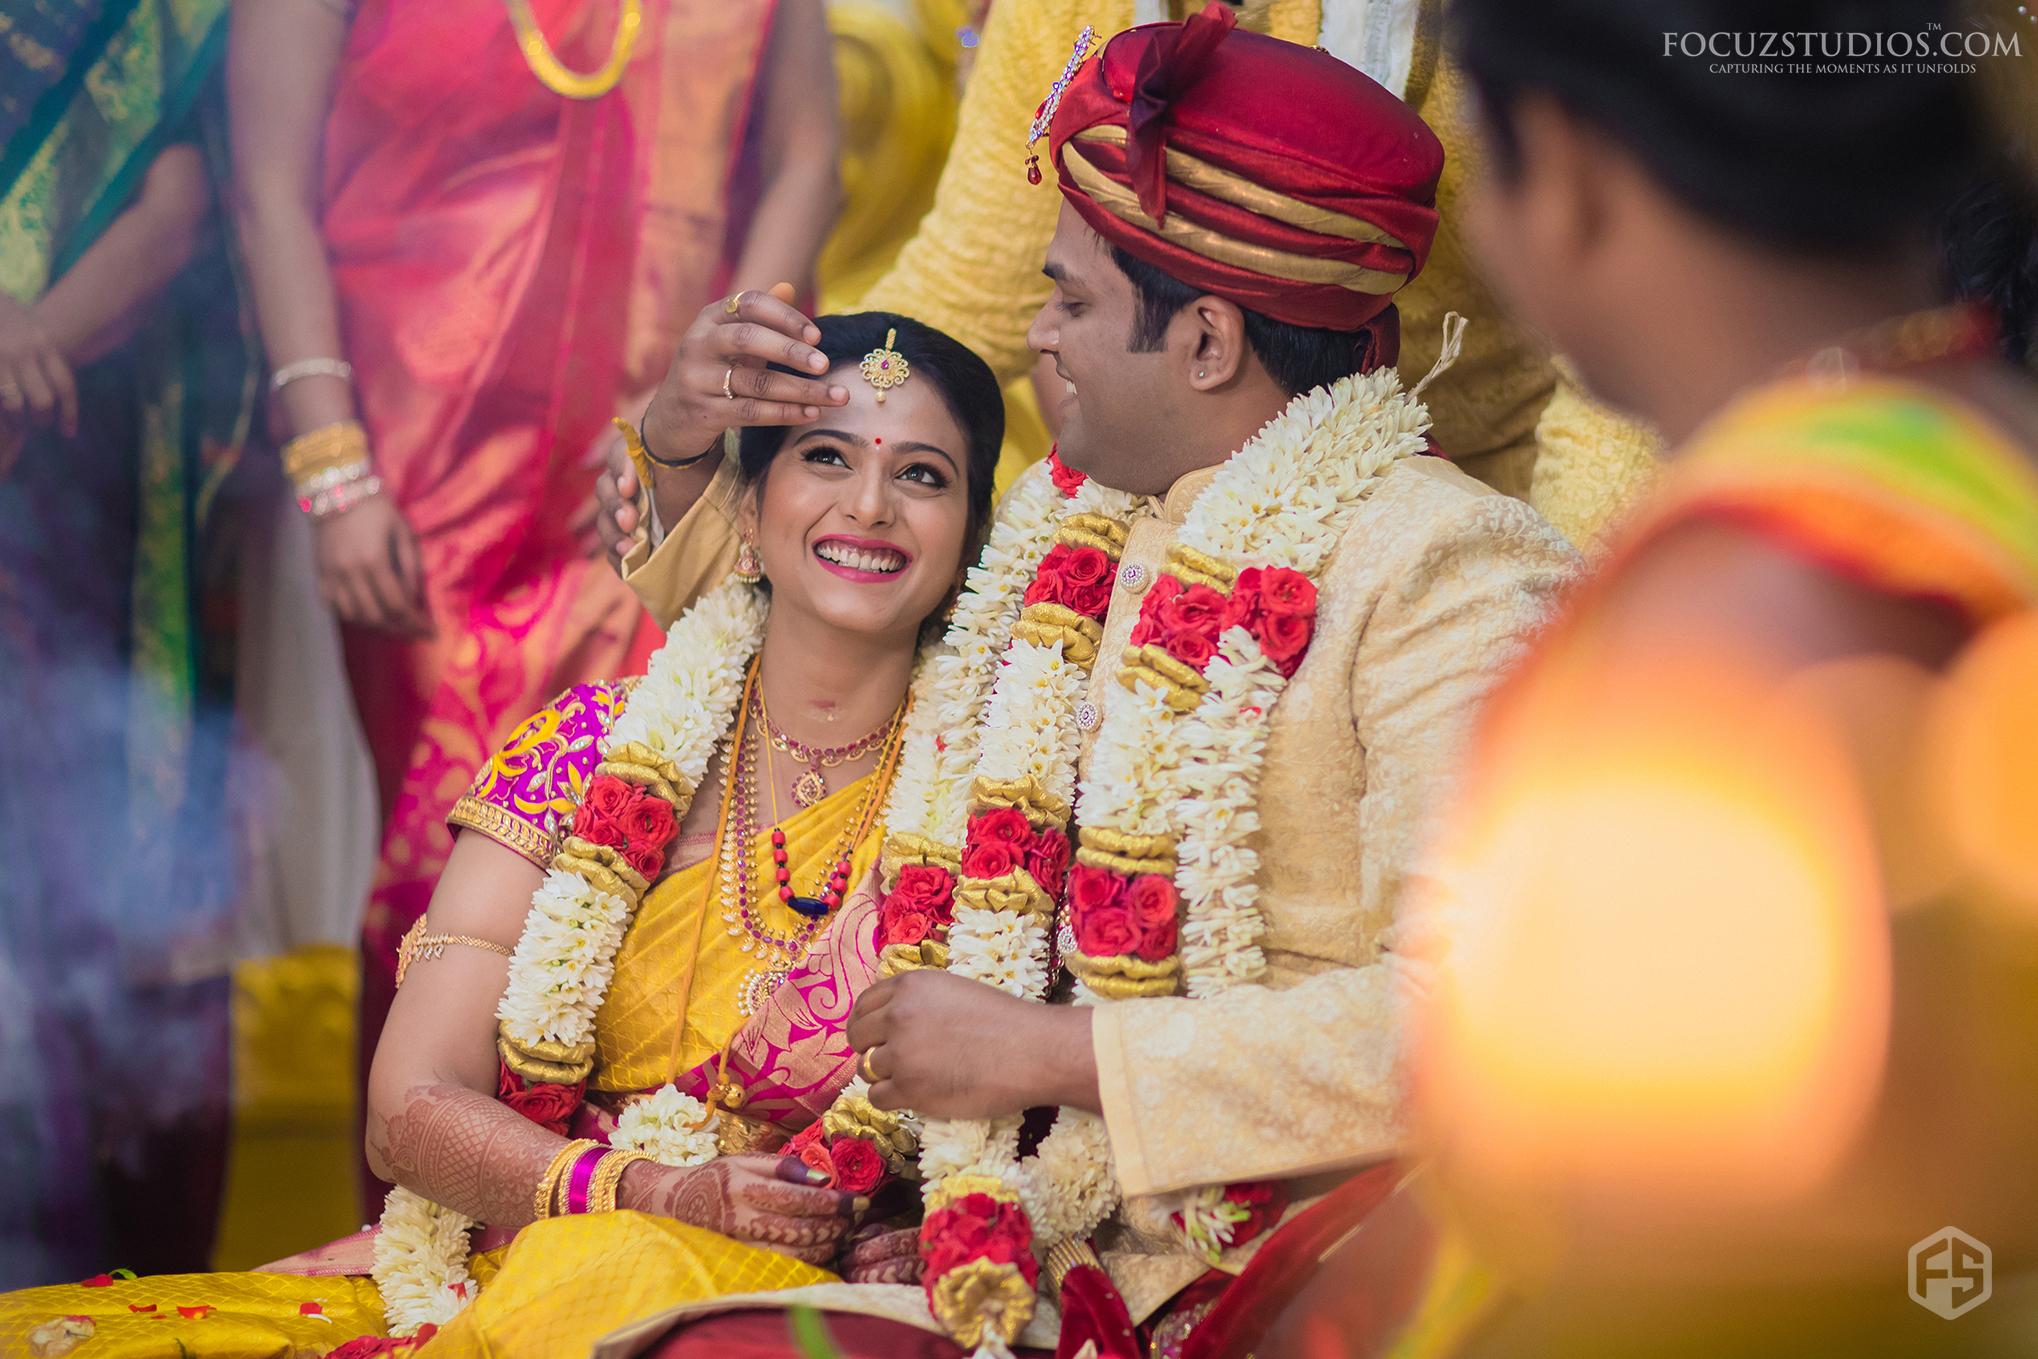 South Indian Wedding Photography Focuz Studios